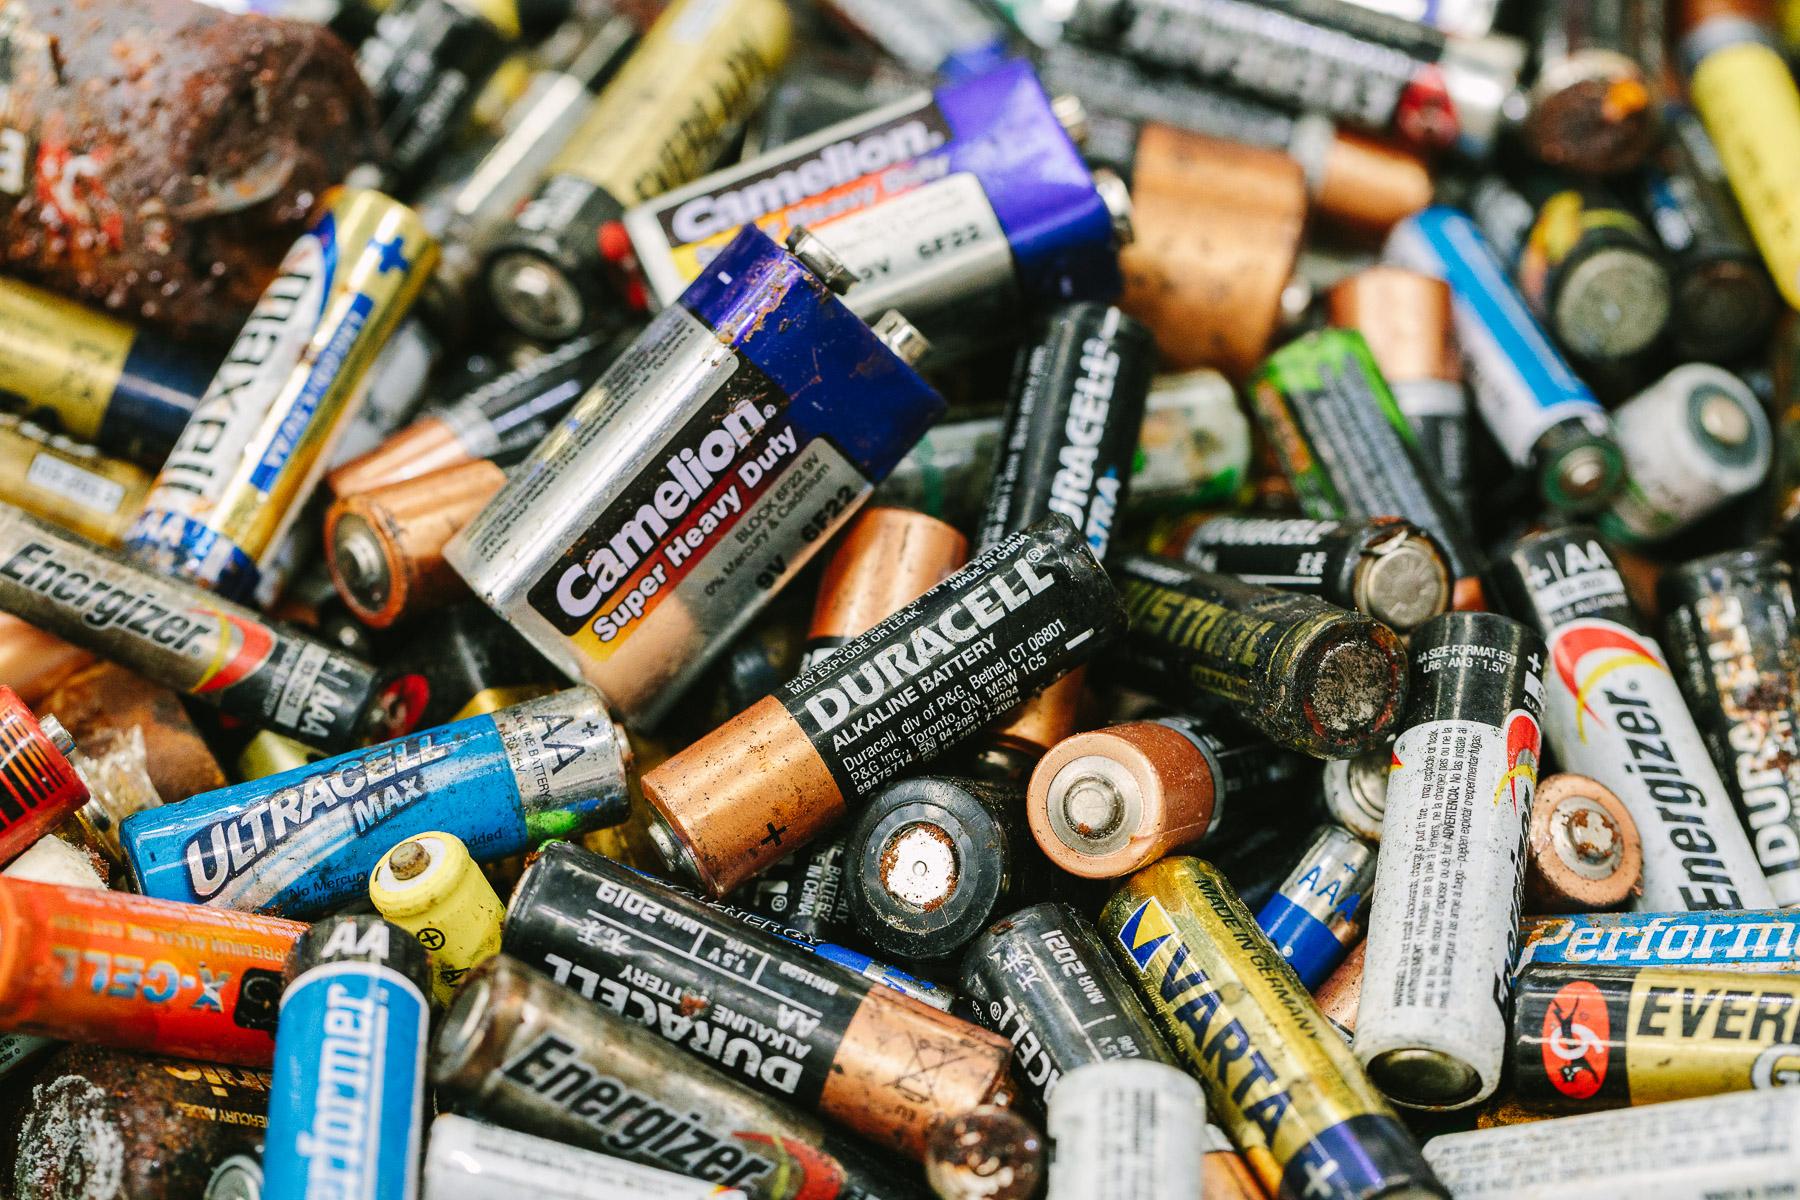 Batteriesfor recycling.jpg